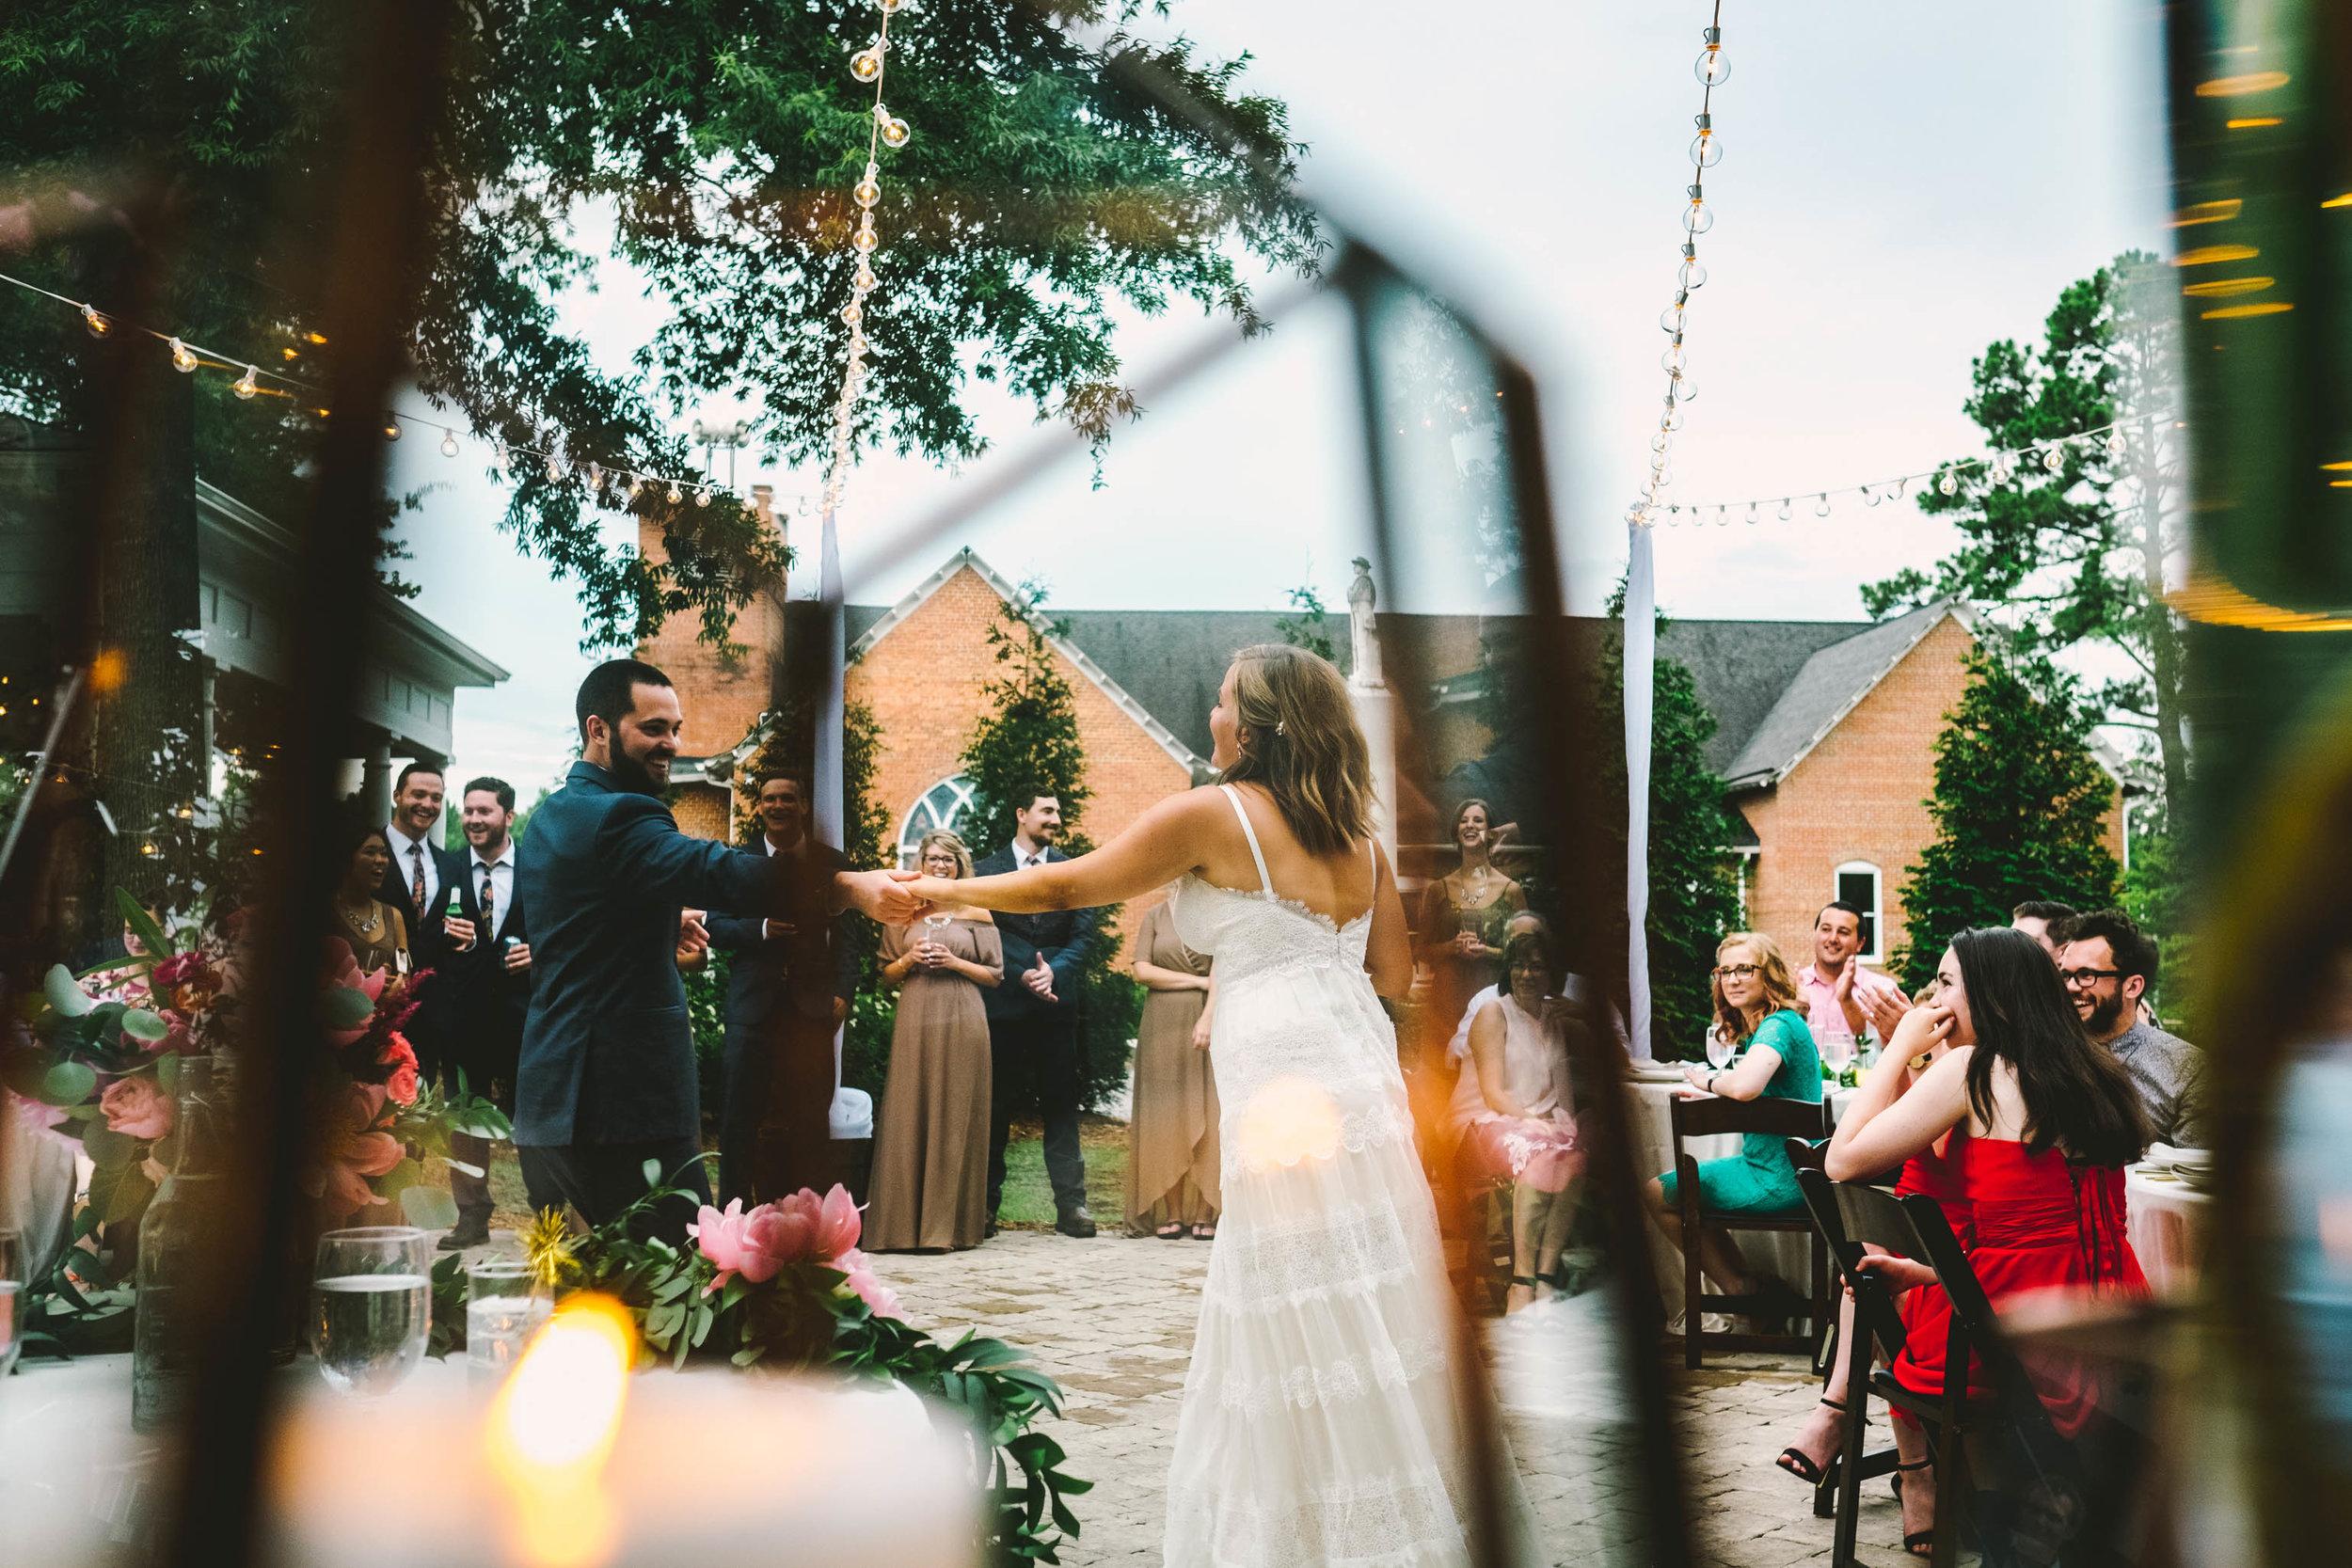 mims-house-wedding-bride-and-groom-first-dance-photos.jpg